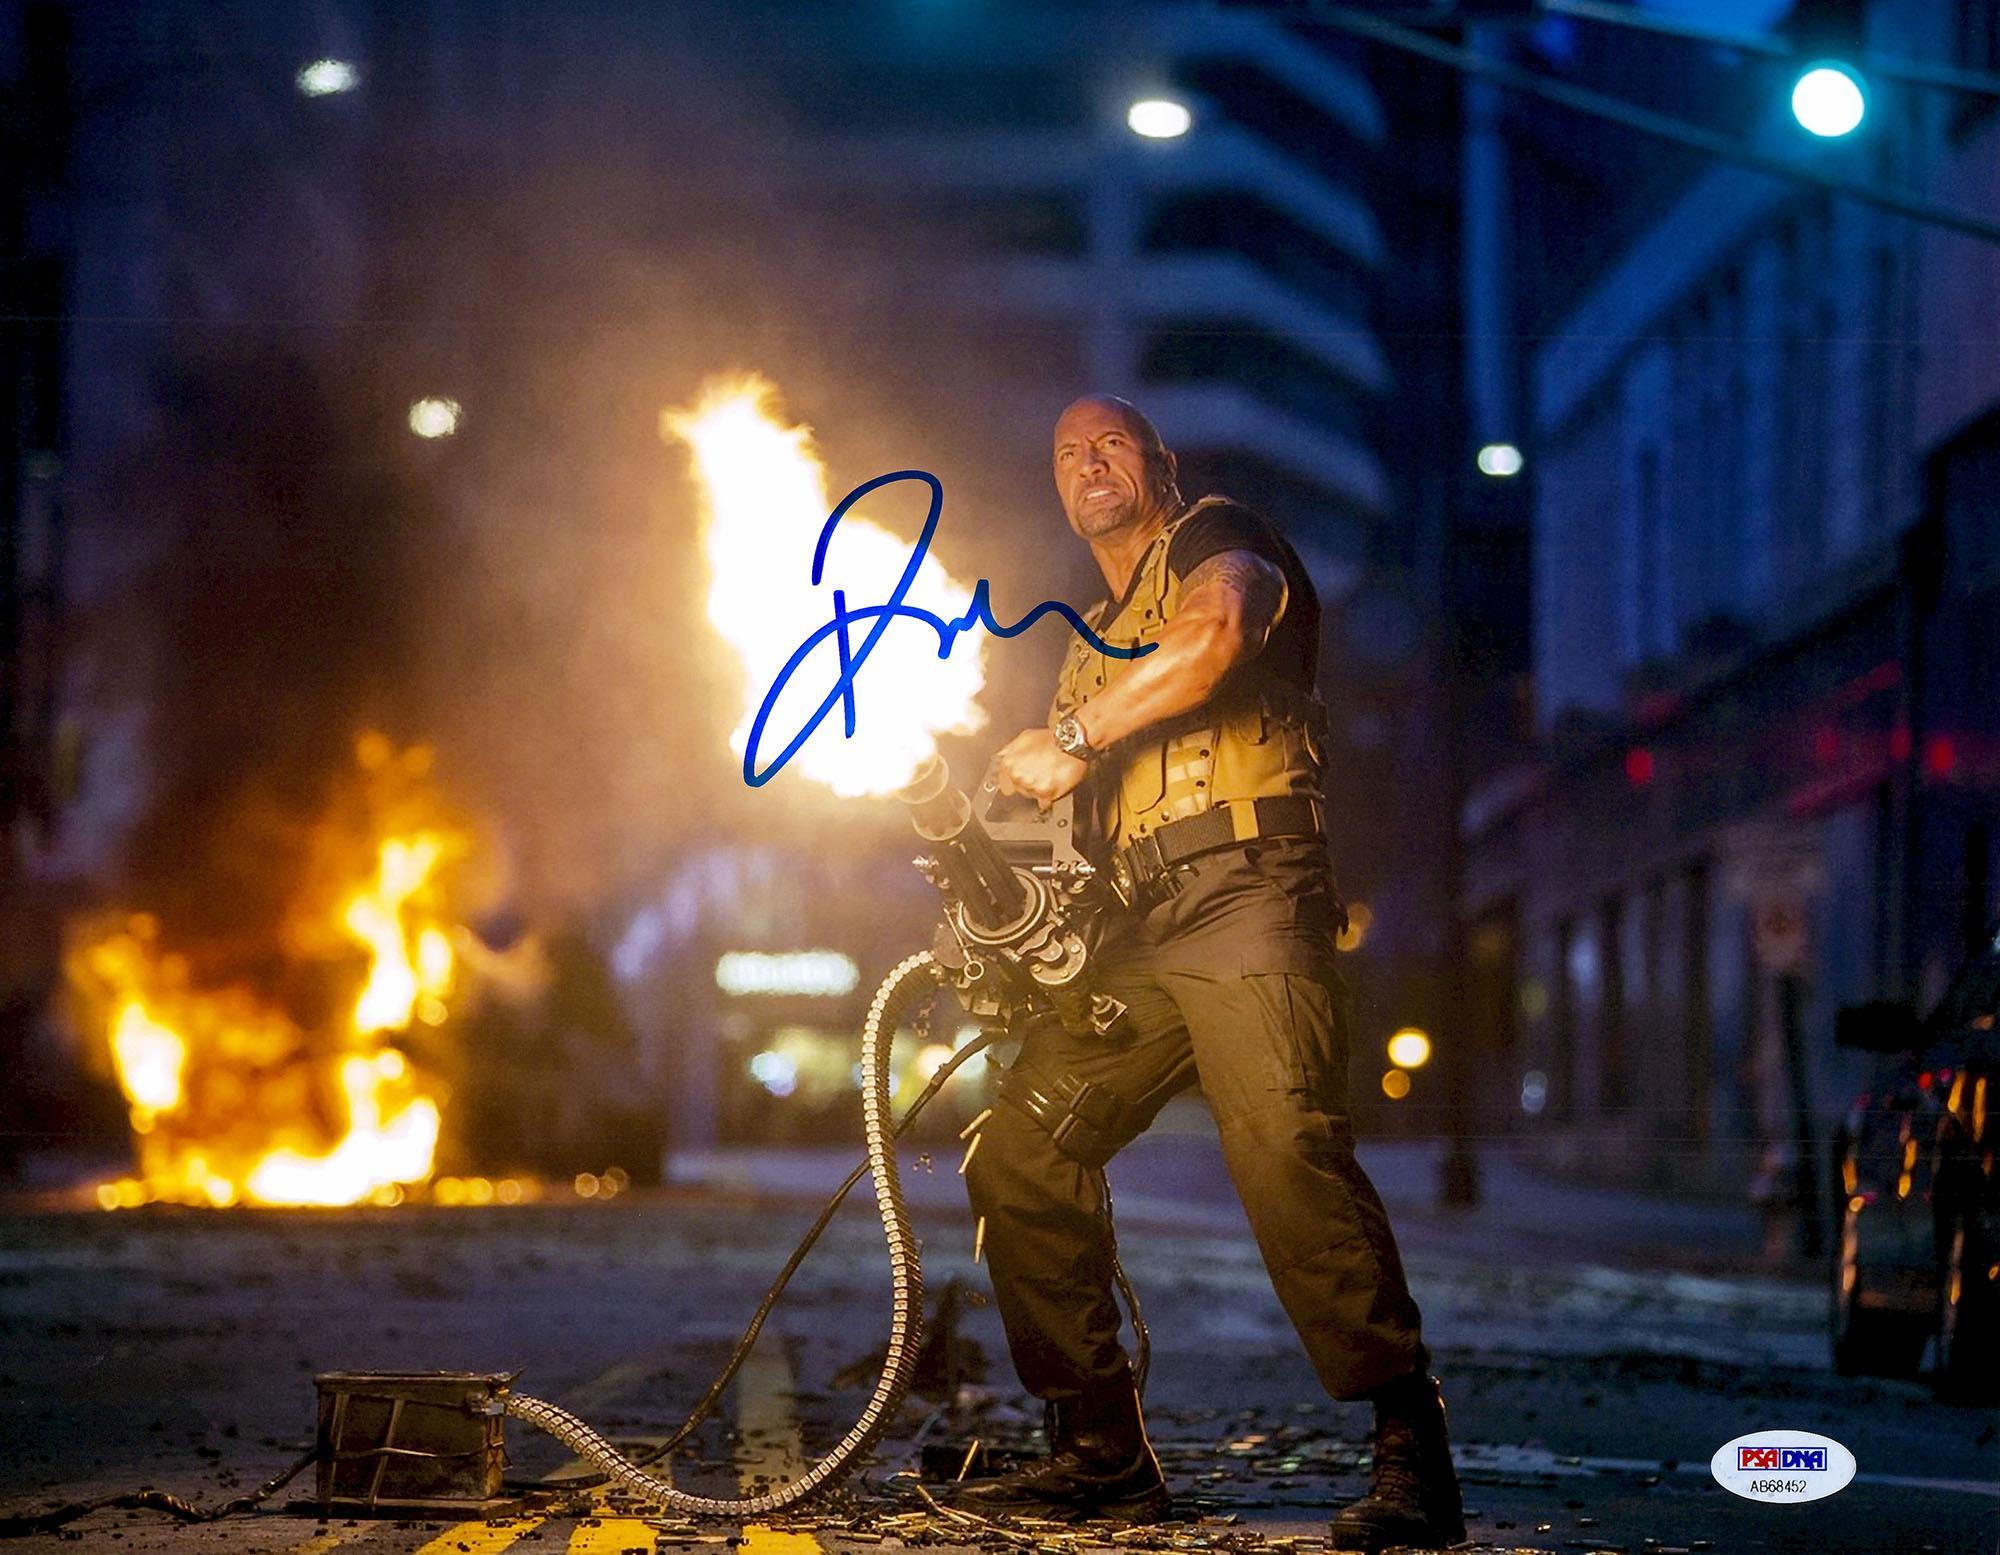 "Dwayne (The Rock) Johnson Autographed 11"" x 14"" Fast & Furious Photograph - PSA/DNA"